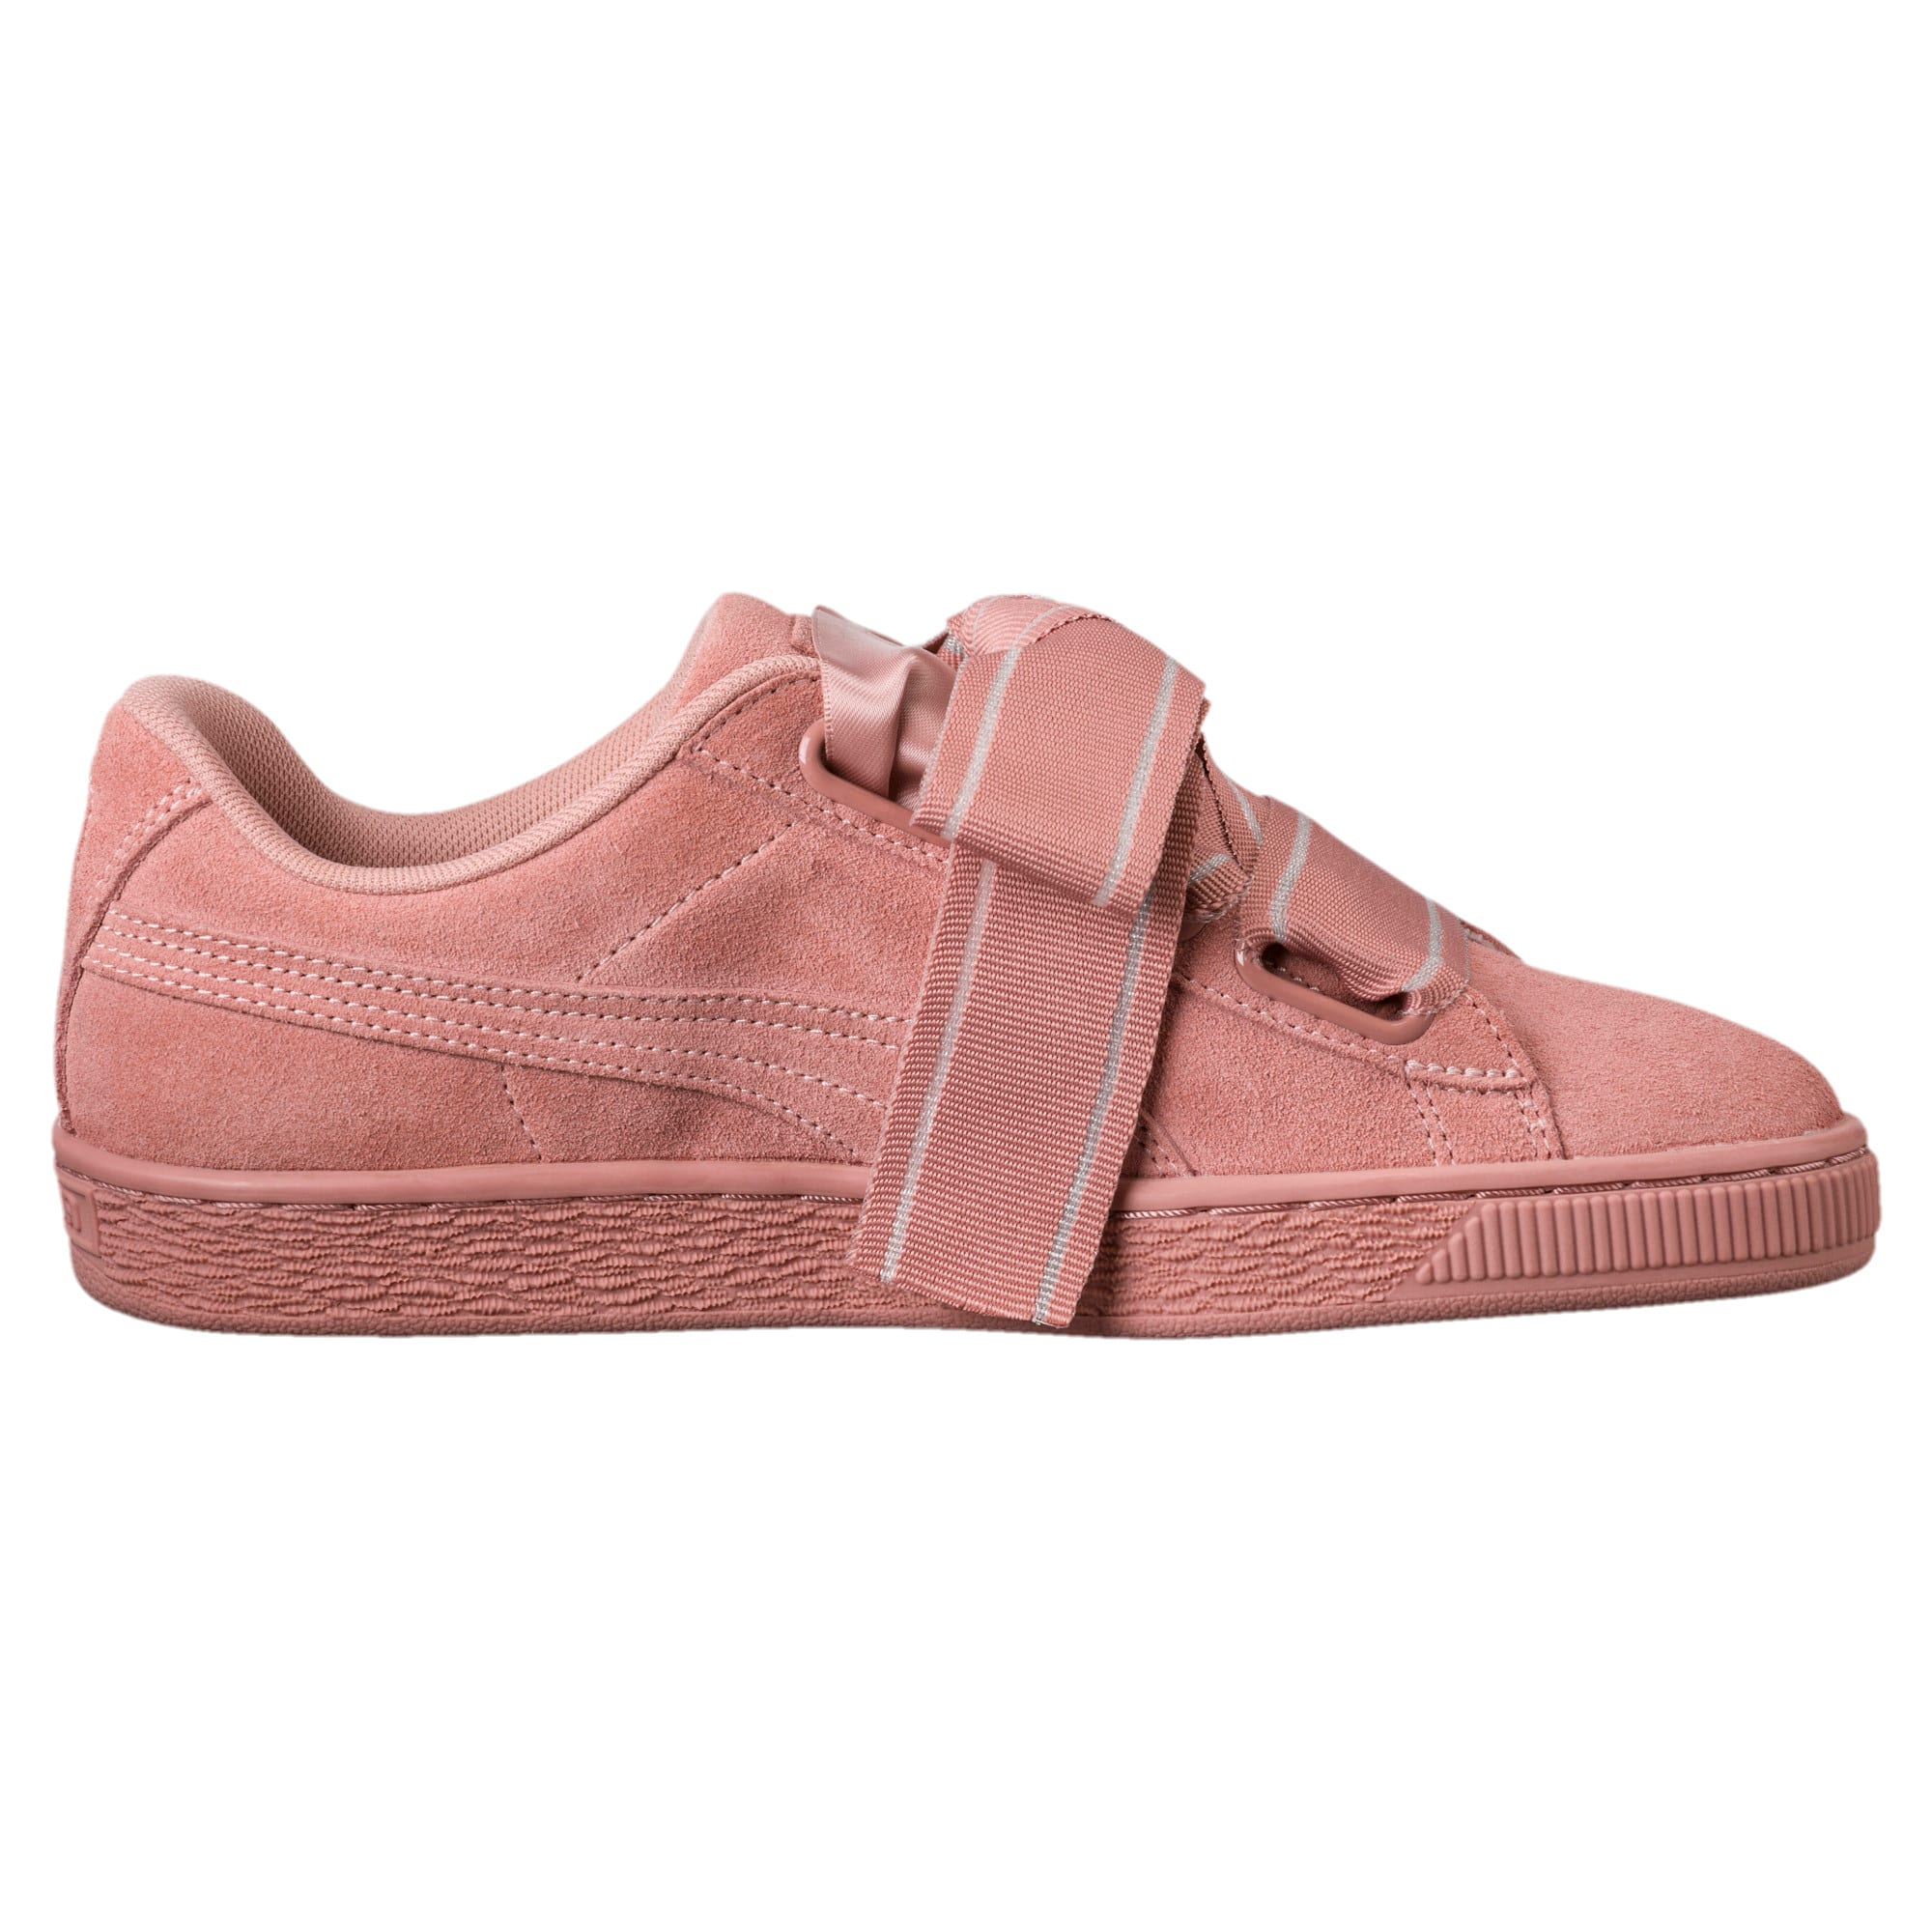 Thumbnail 3 of Suede Heart Satin II Women's Sneakers, Cameo Brown-Cameo Brown, medium